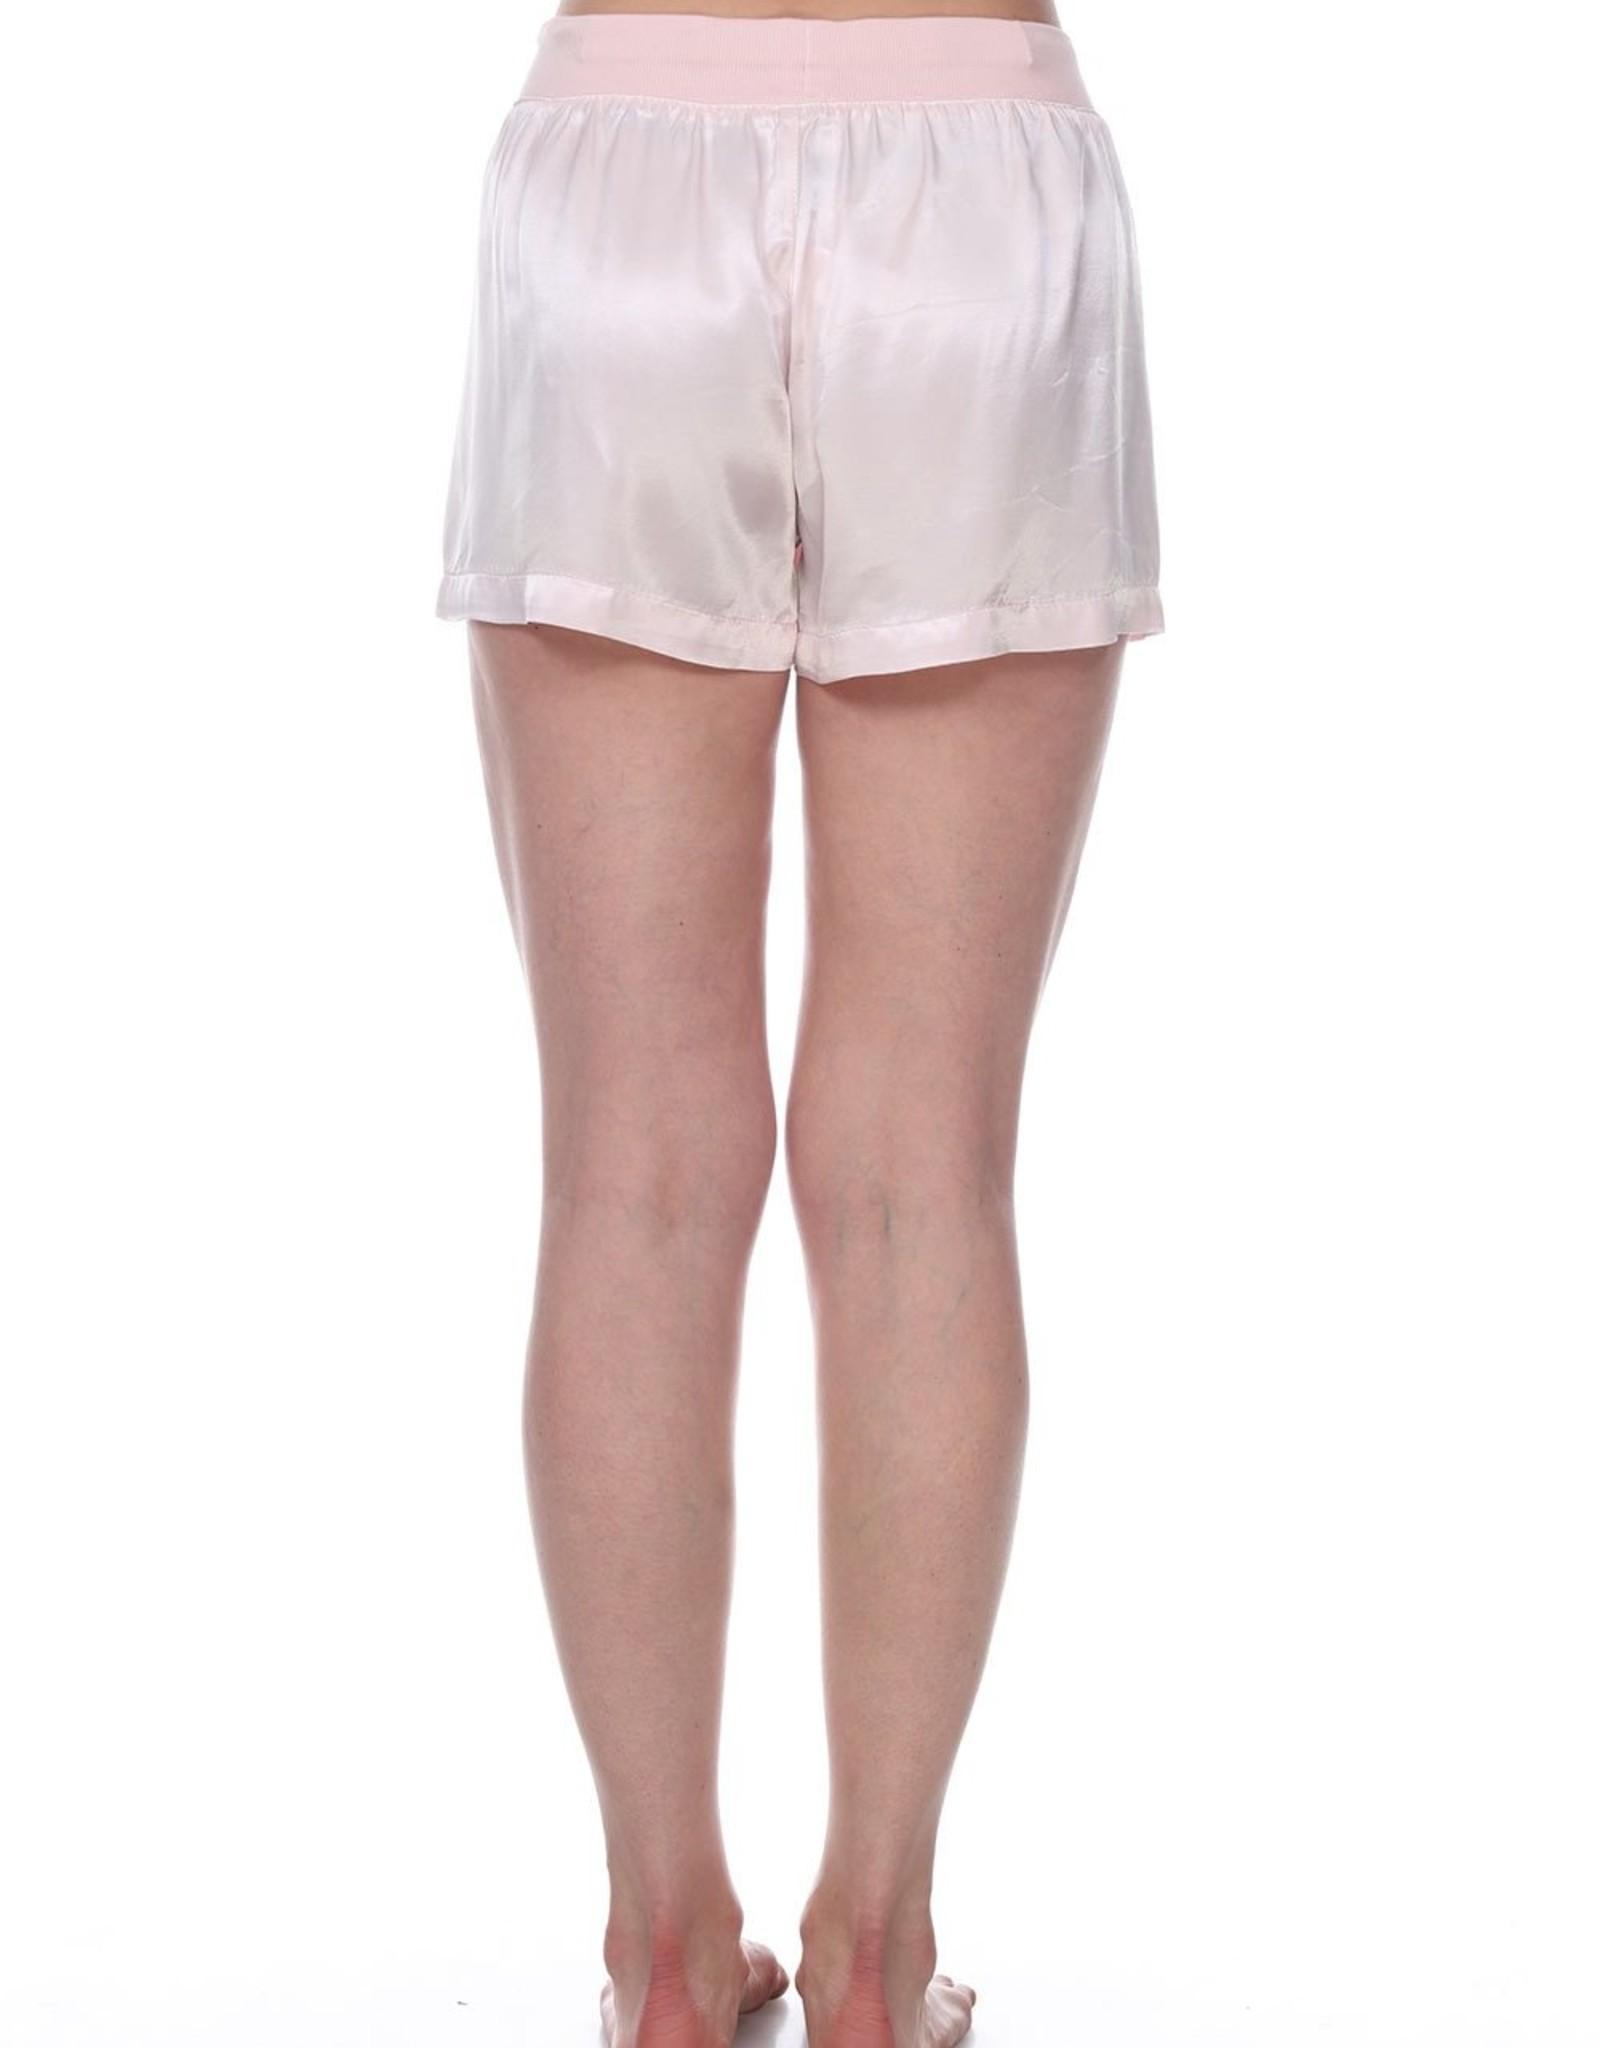 PJ Harlow Mikel Shorts